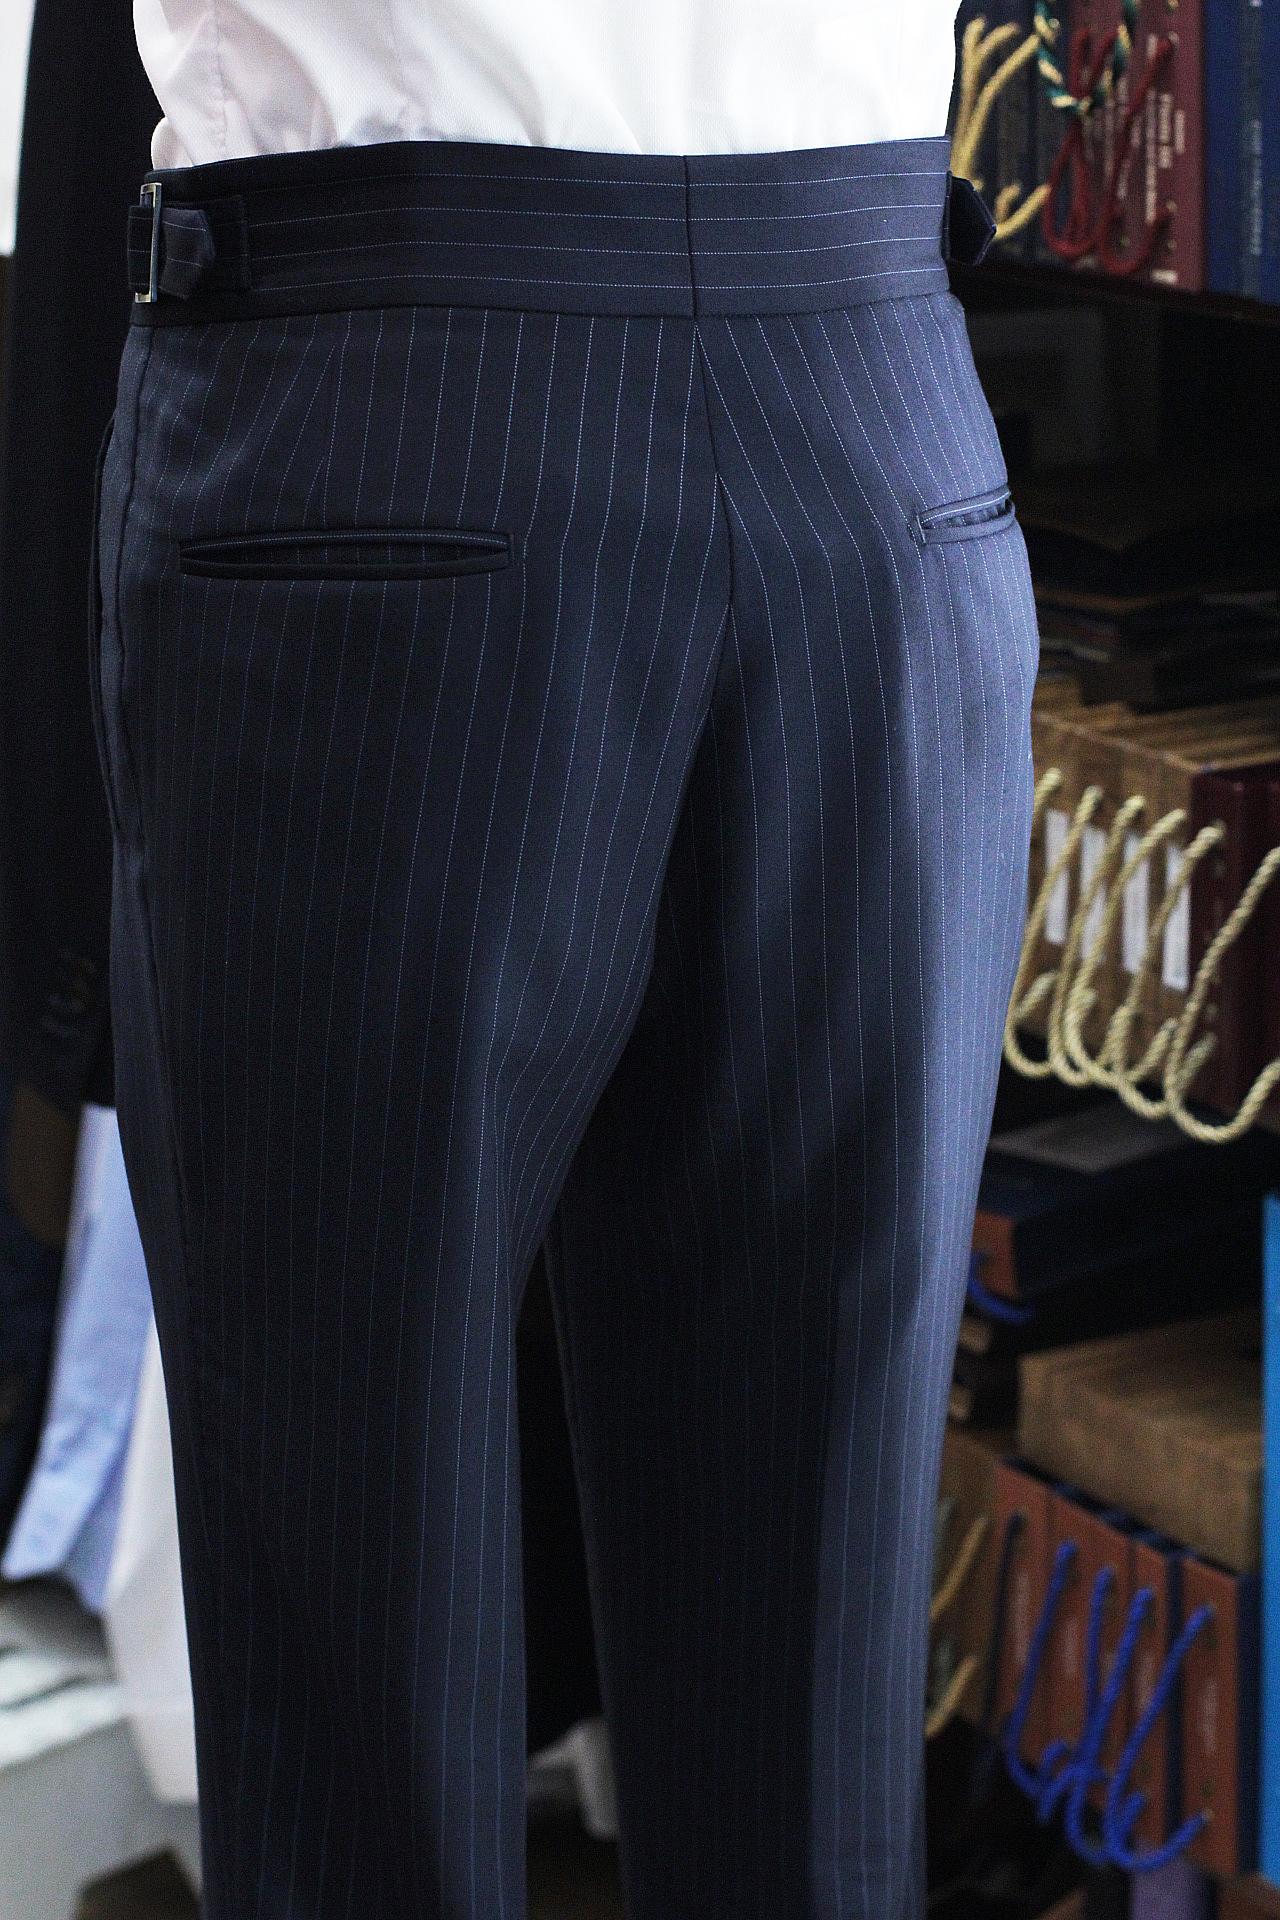 Super 120s Pinstripe Gurkha Trousers Double Pleated Trousers Singapore Bespoke Tailor.JPG